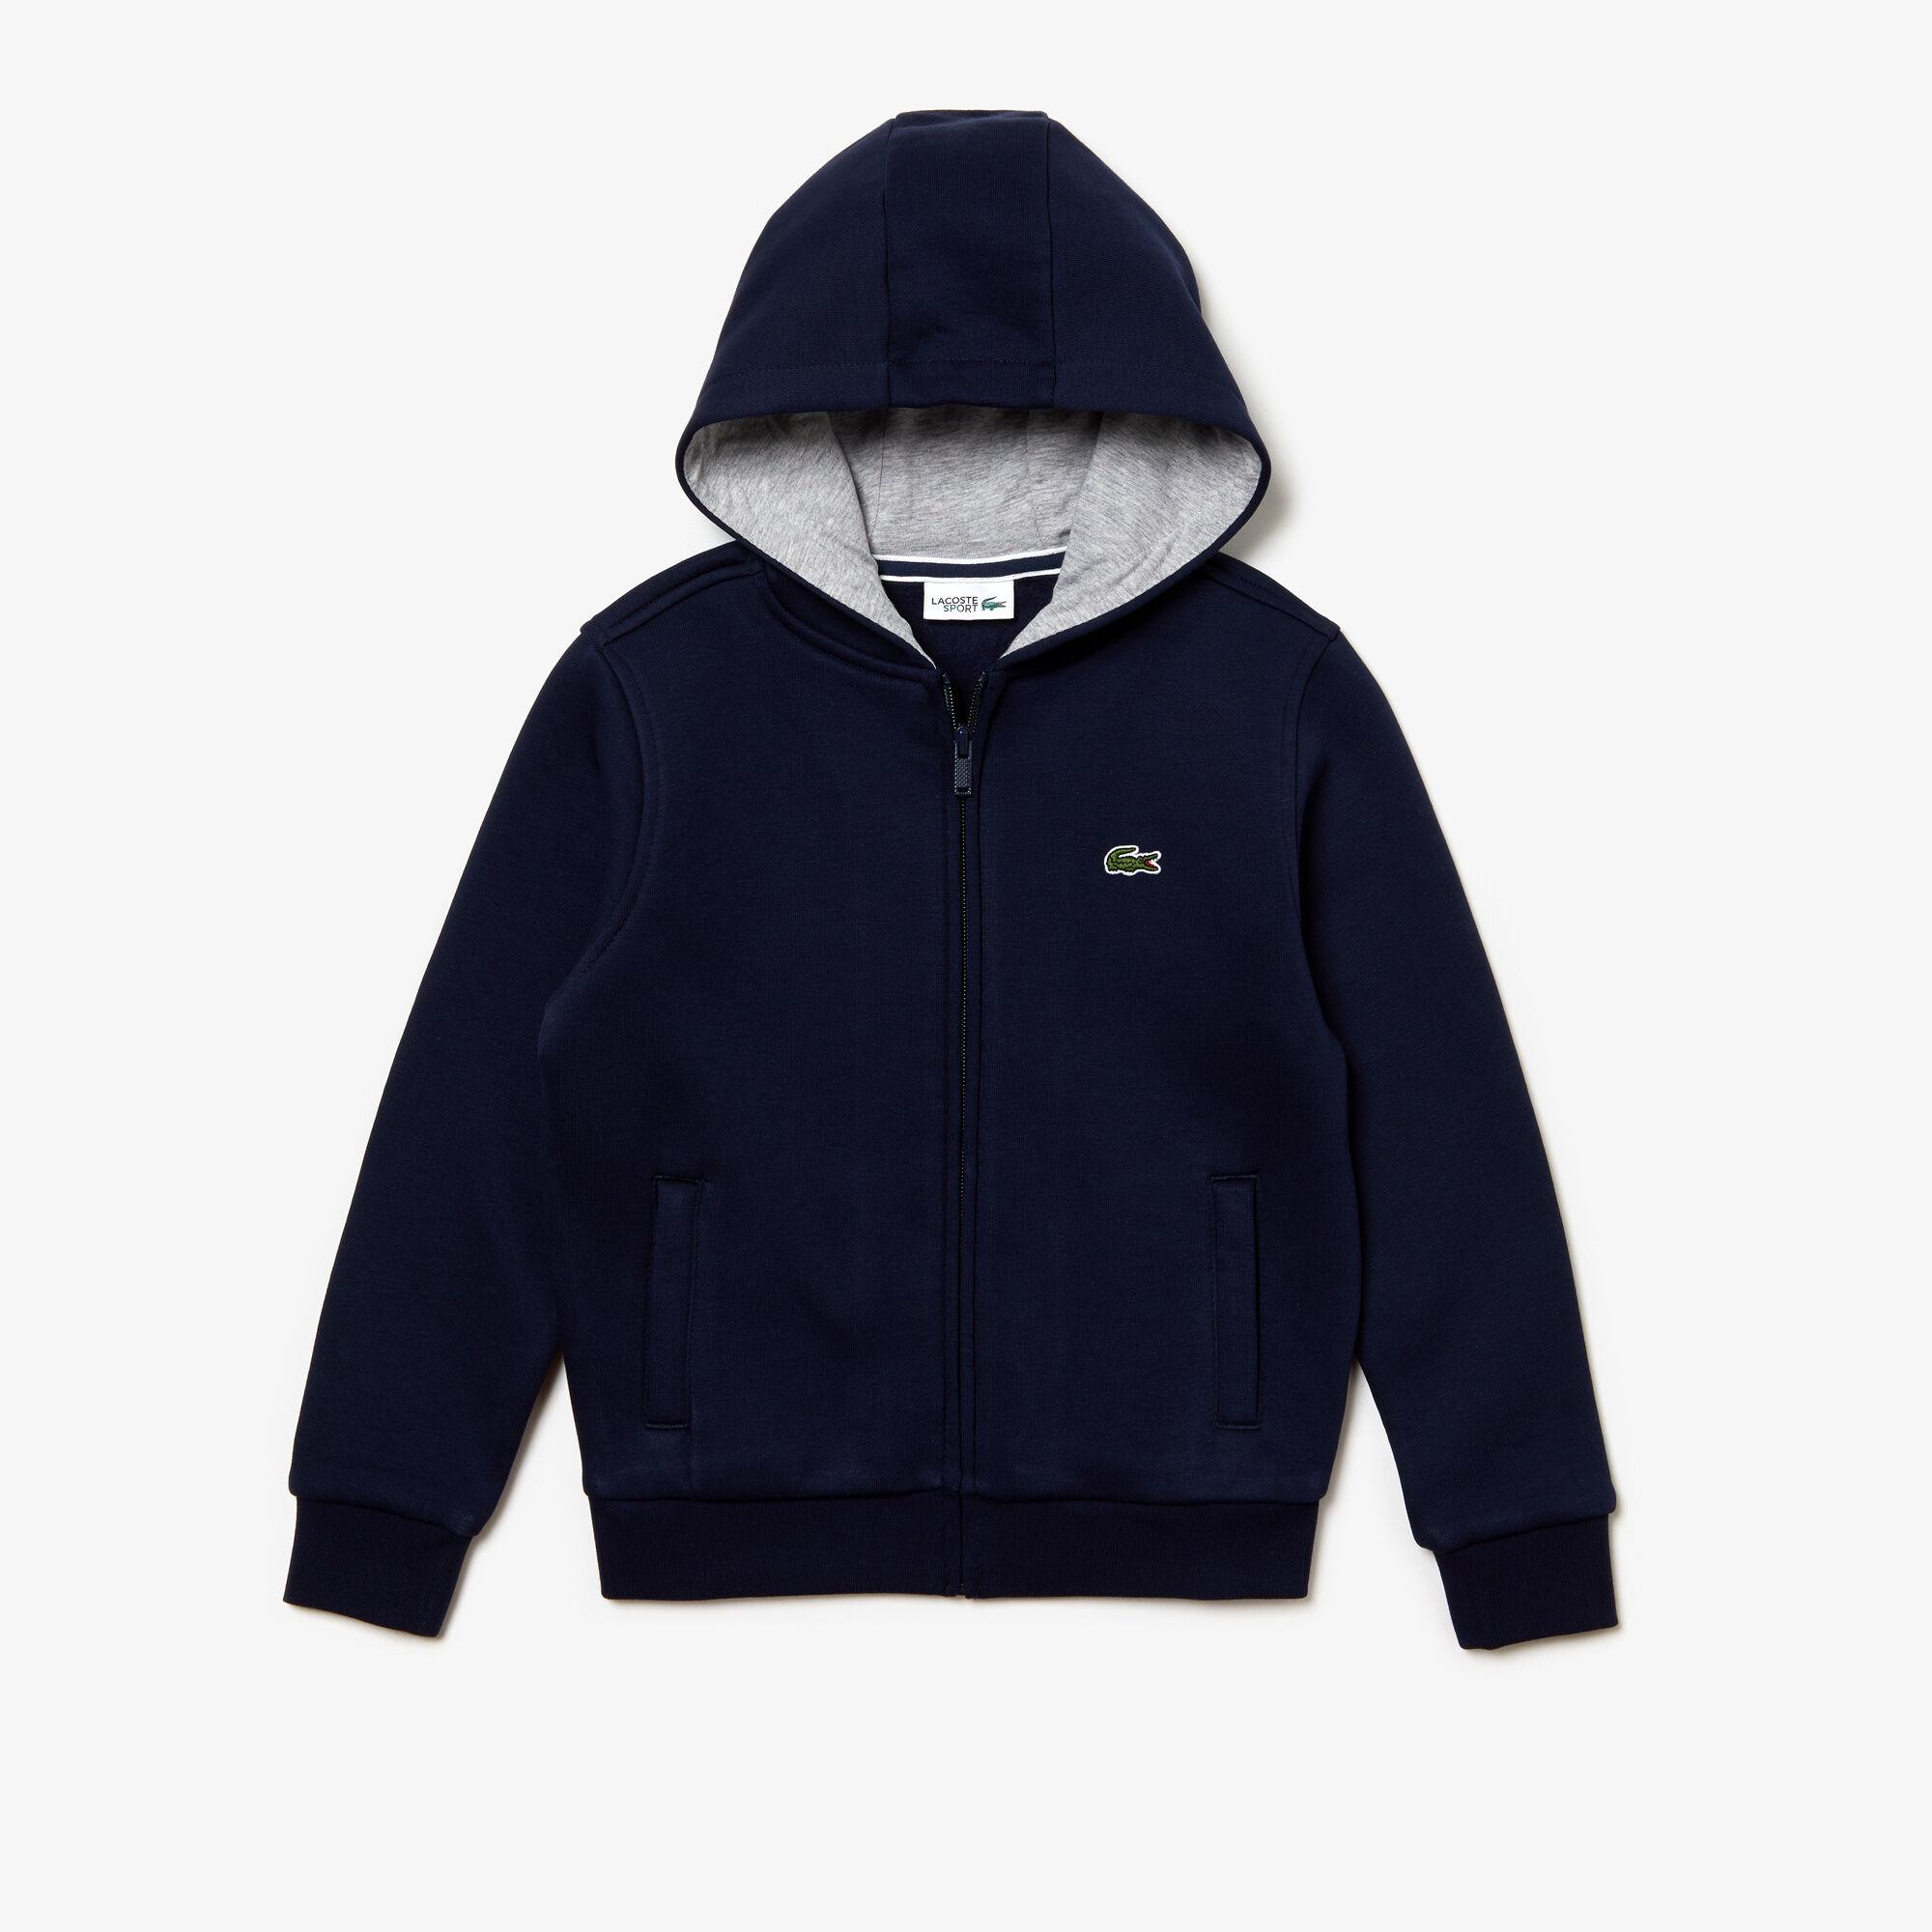 Kids' Lacoste SPORT Tennis Zippered Fleece Sweatshirt